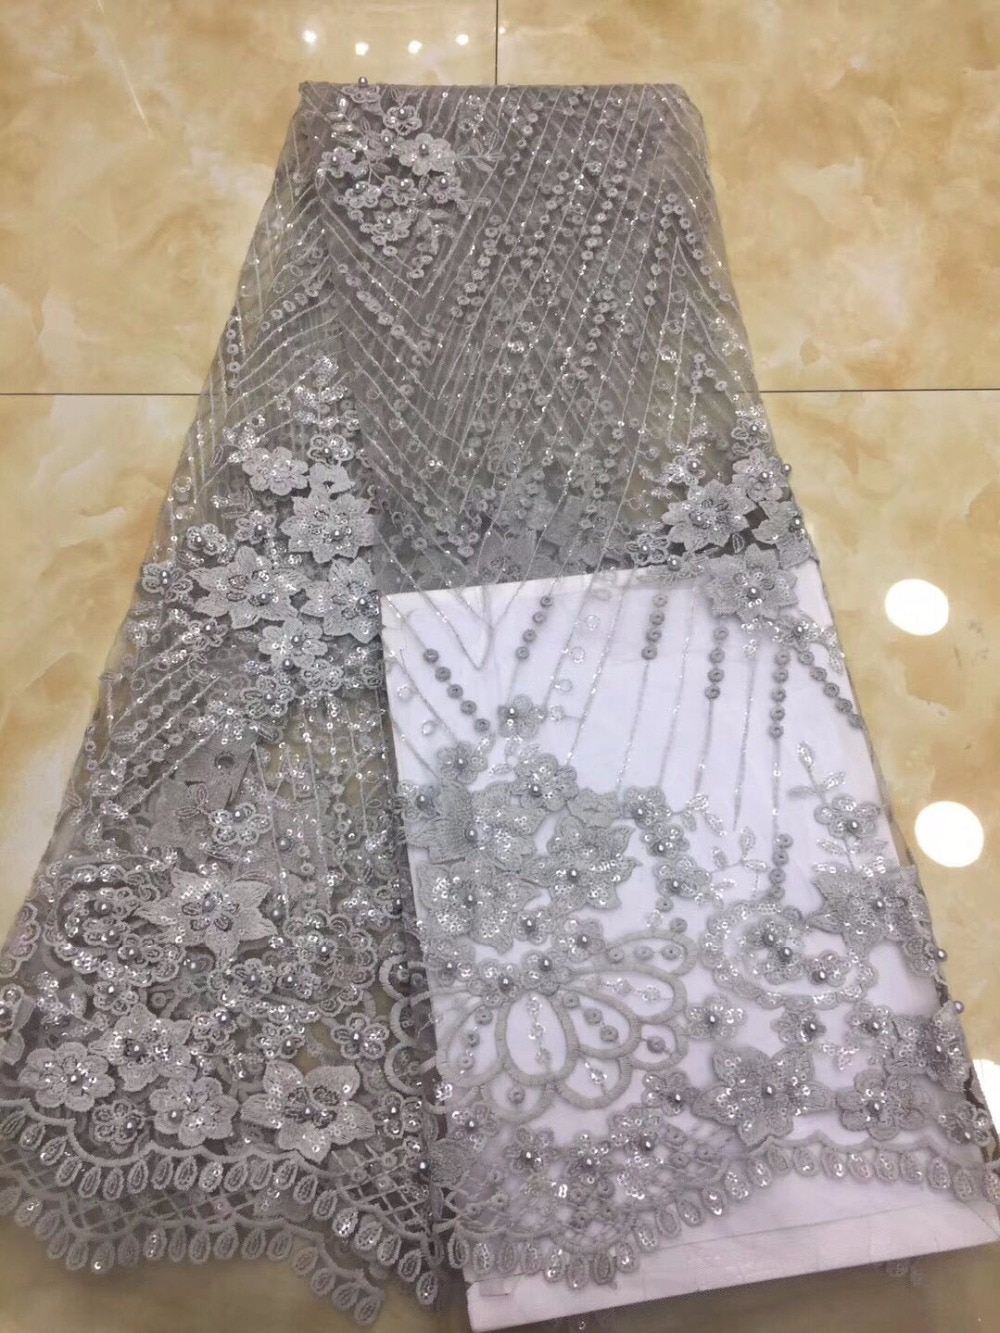 ¡Oferta! tela de encaje elegante pani África, aplique de plata francesa de alta calidad, tul con cuentas 3D, tela de encaje, lentejuelas, ropa real de dubai (419